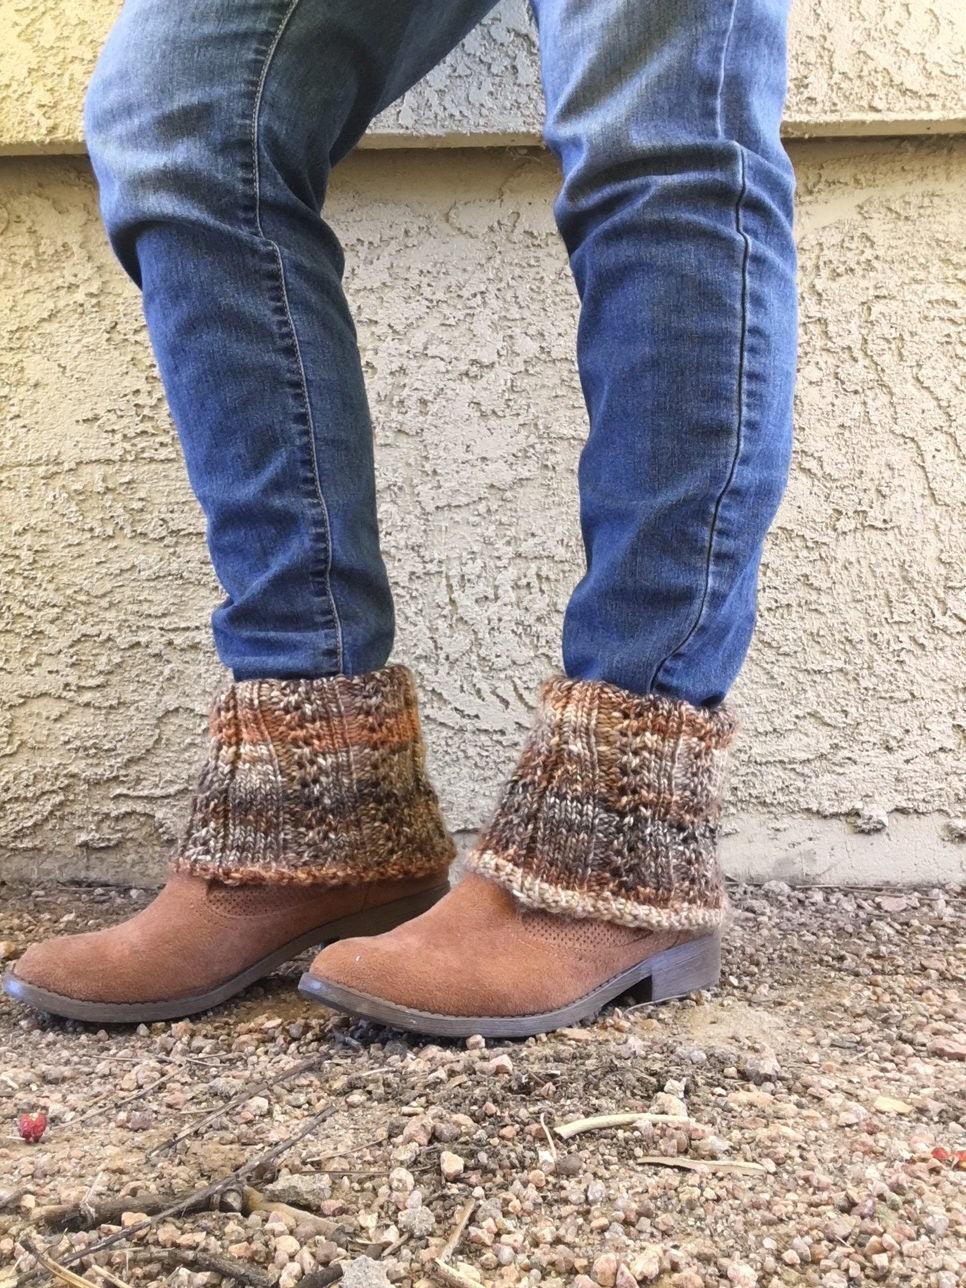 Ankle Boot Cuffs A Loom Knit Pattern